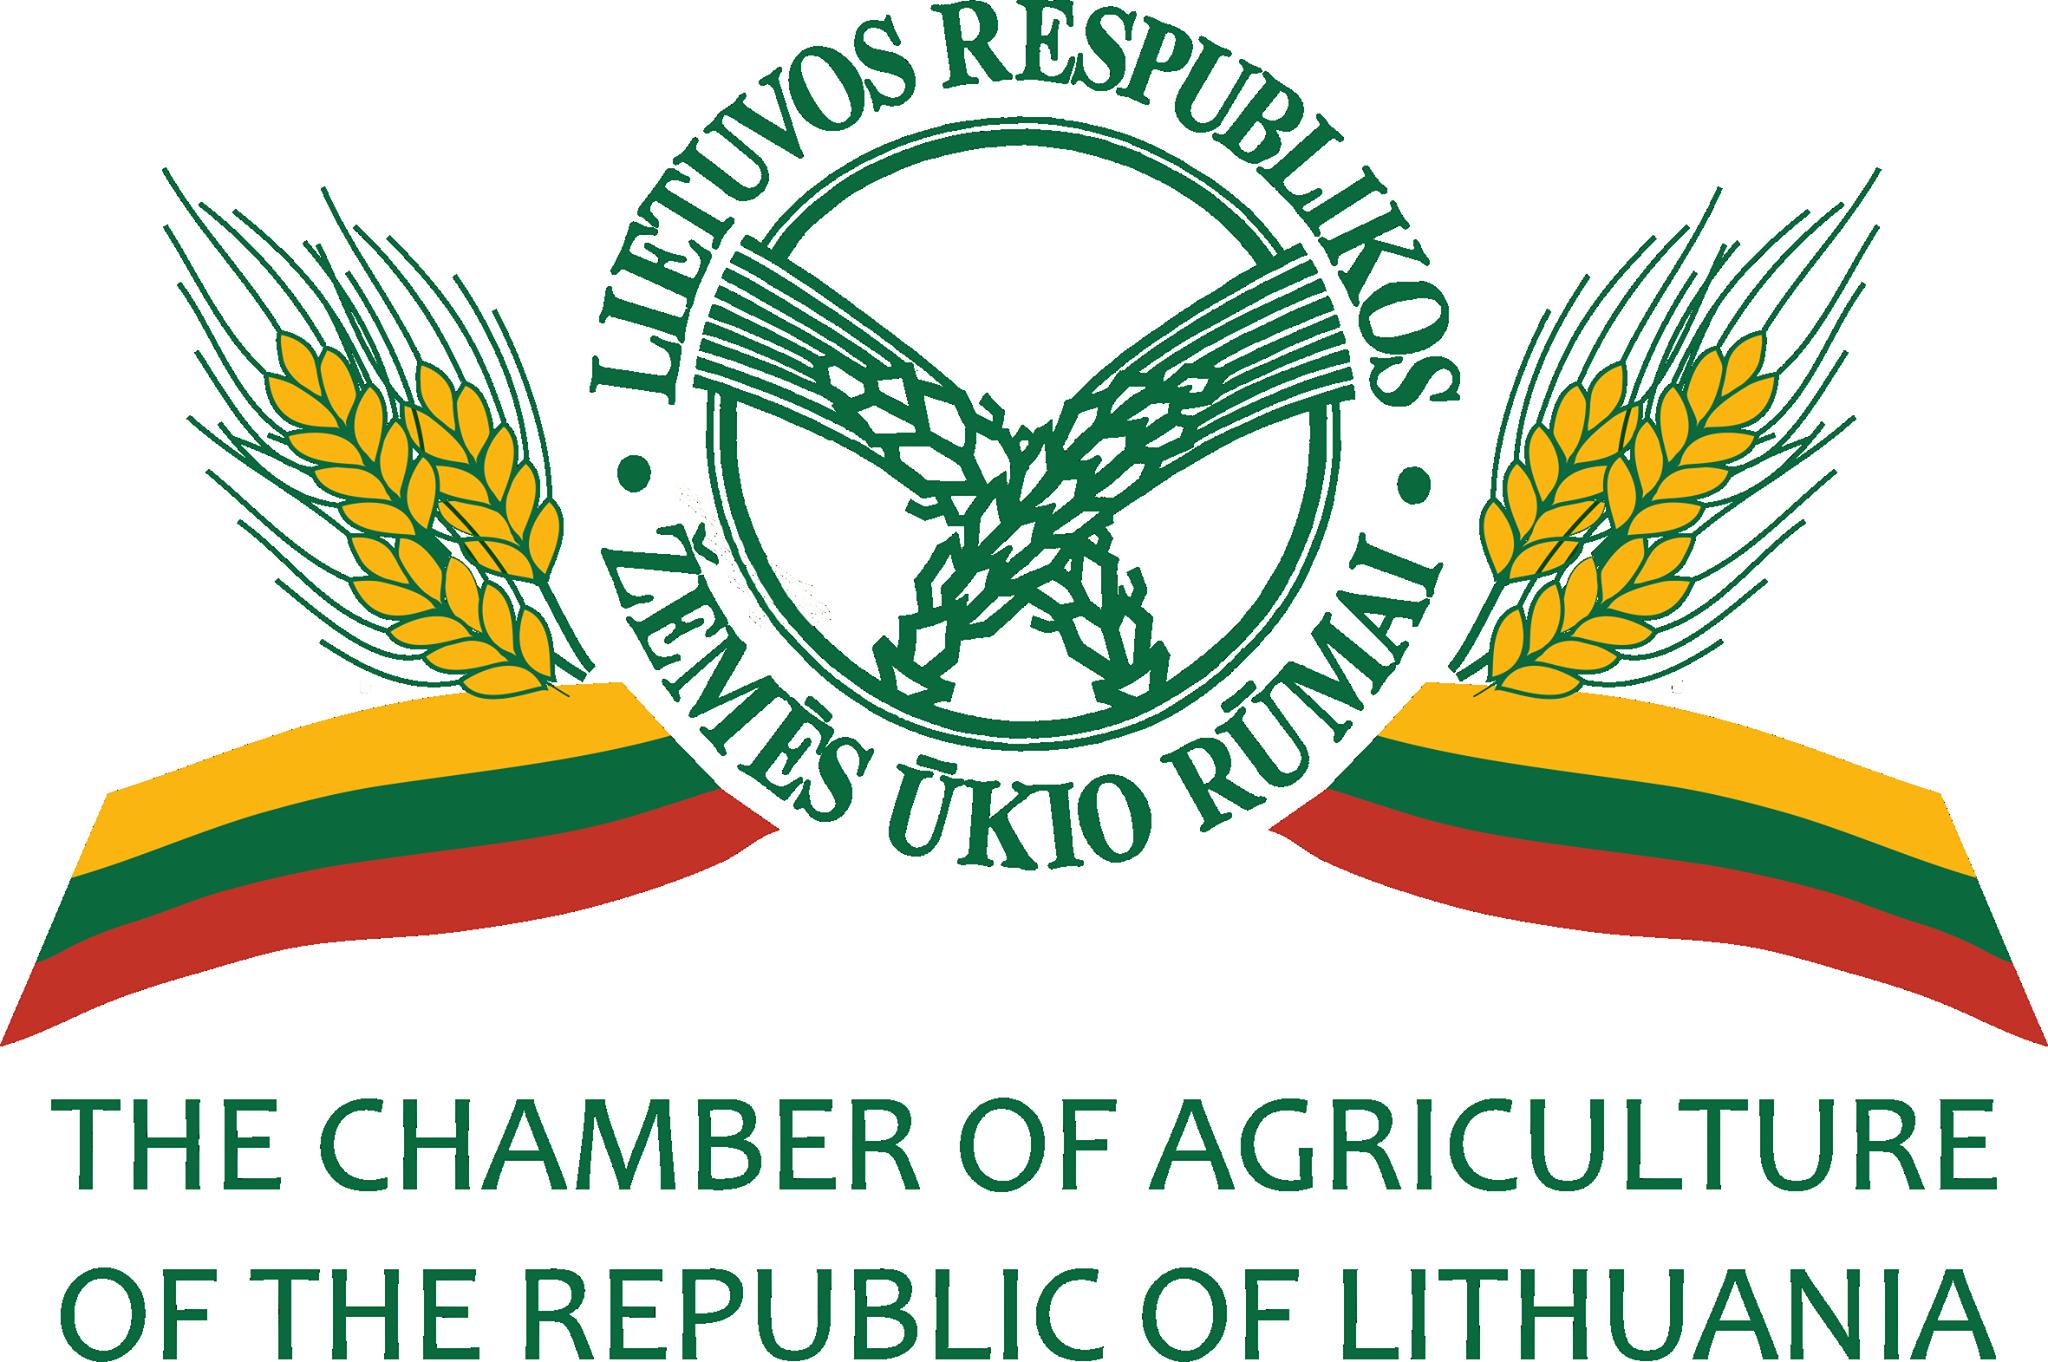 zemes ukio rumai logo